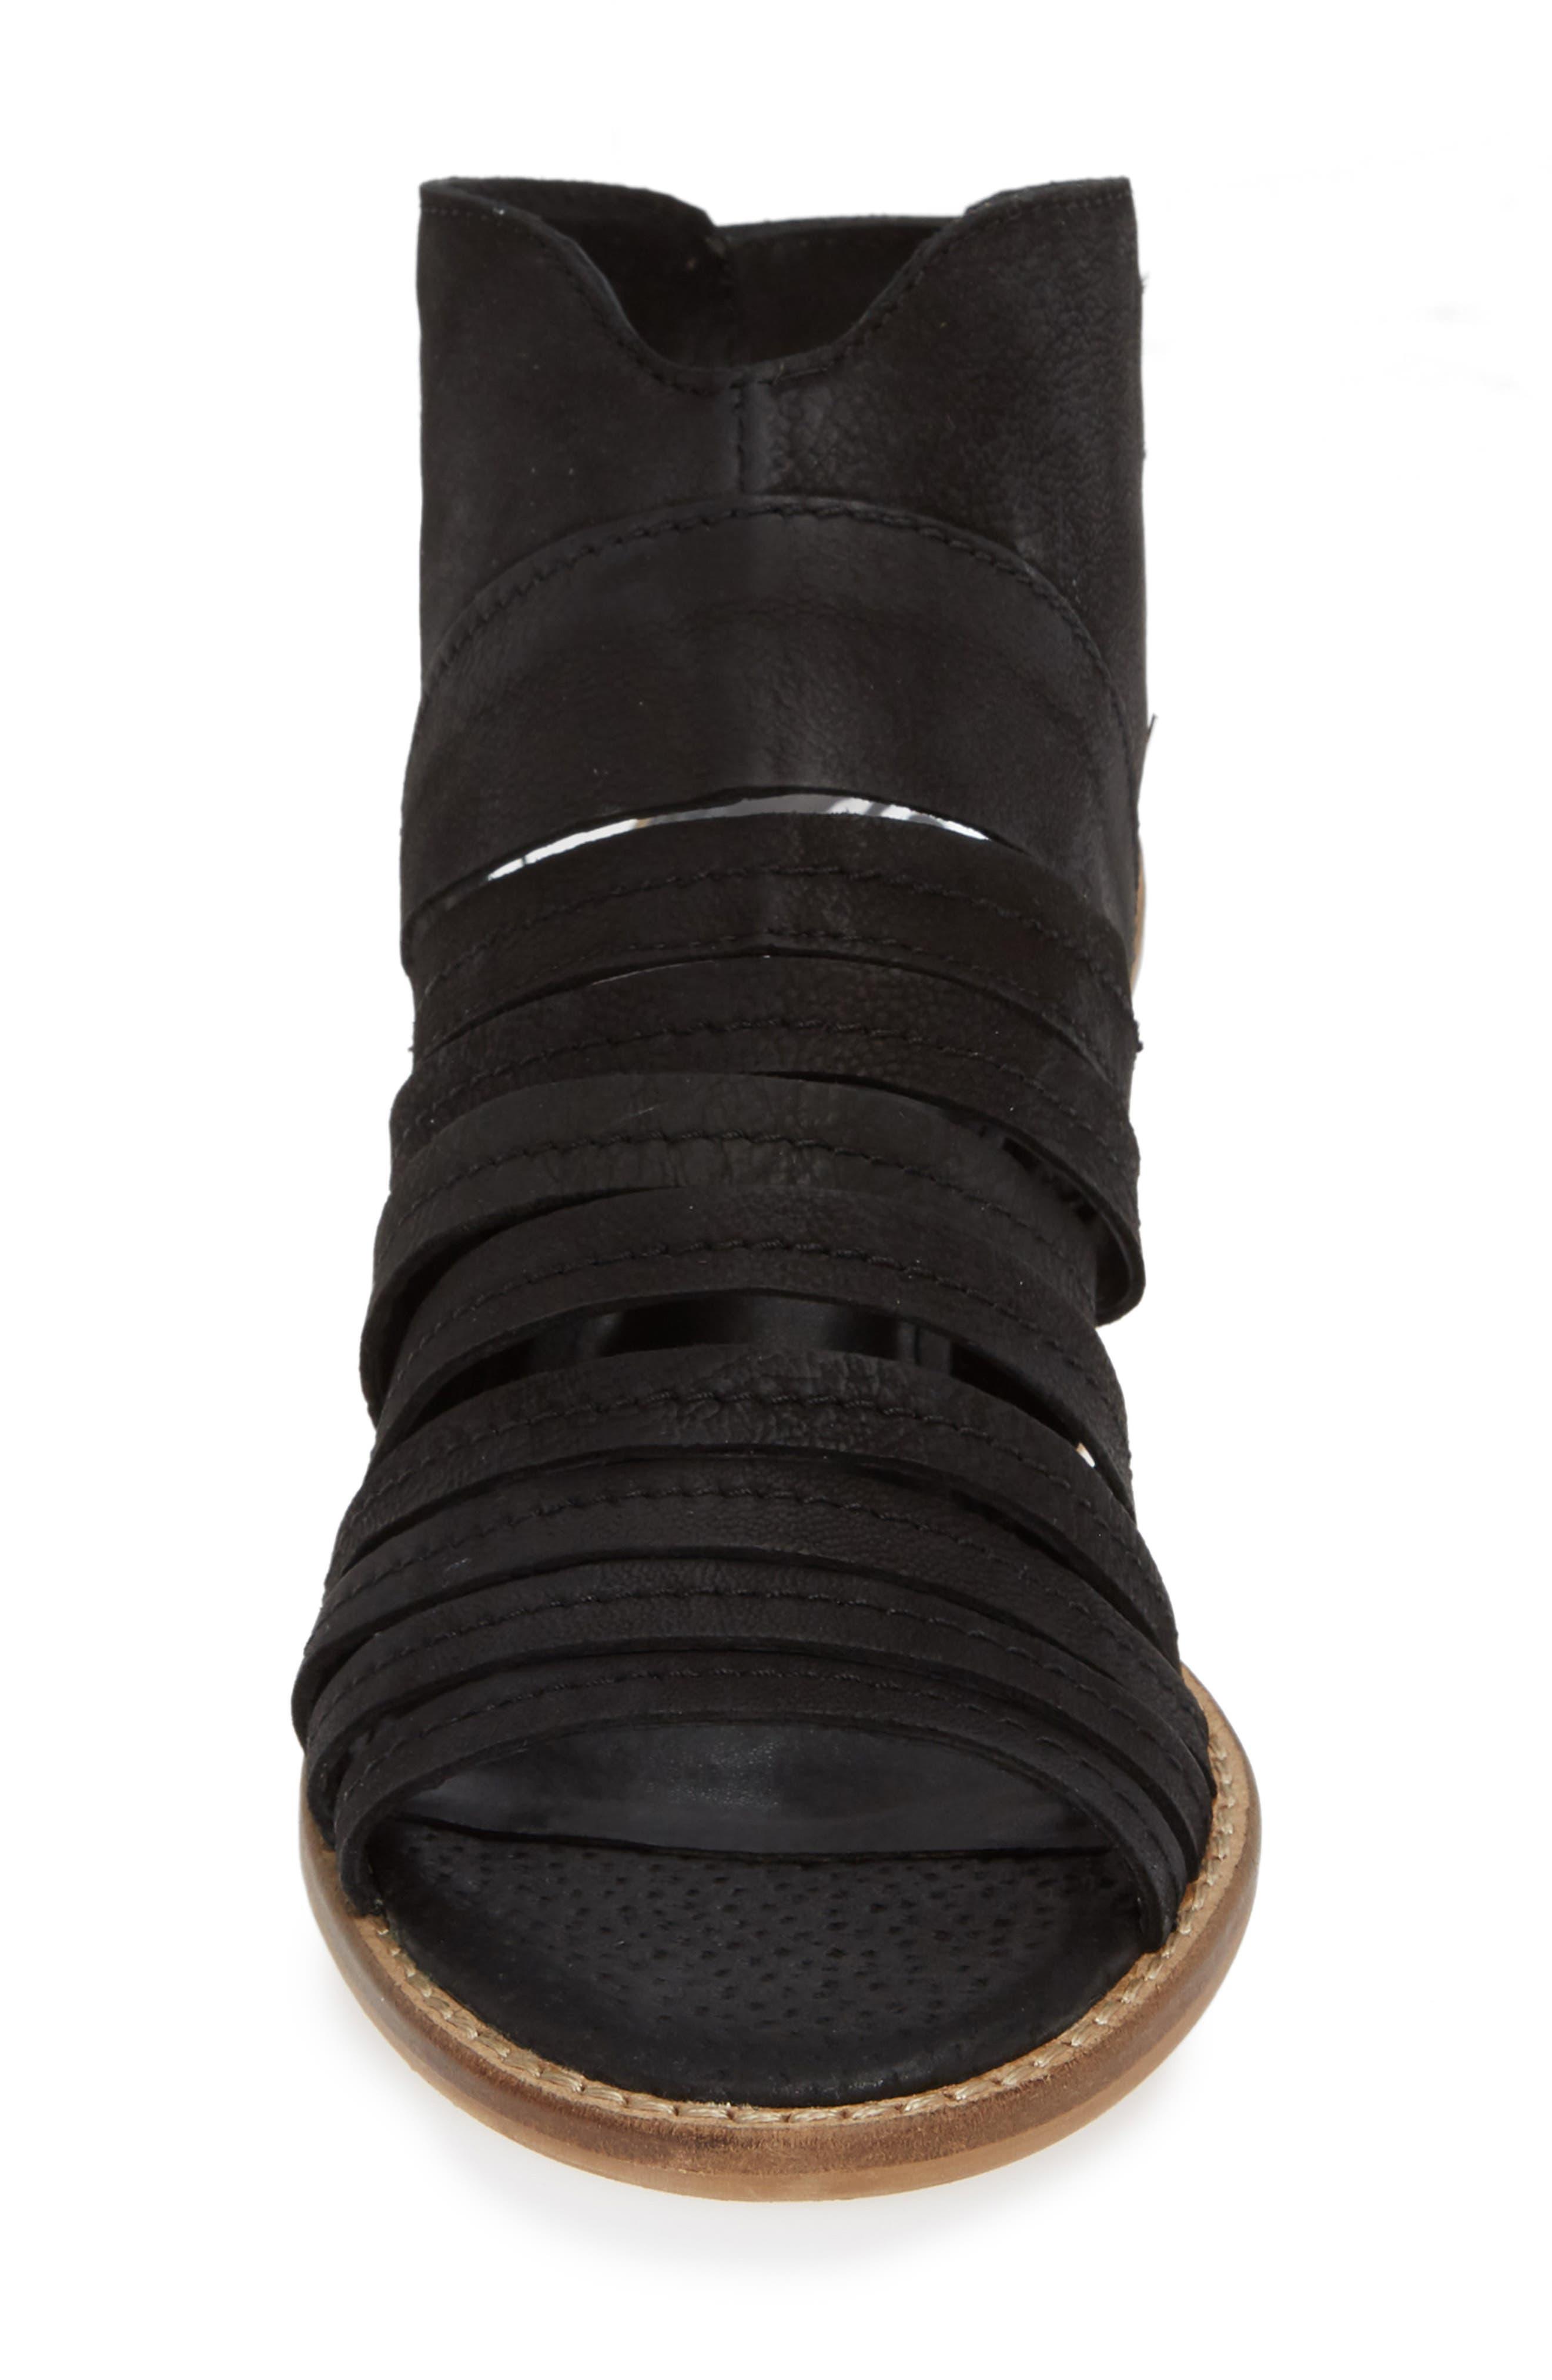 Ainsworth Sandal,                             Alternate thumbnail 4, color,                             BLACK LEATHER